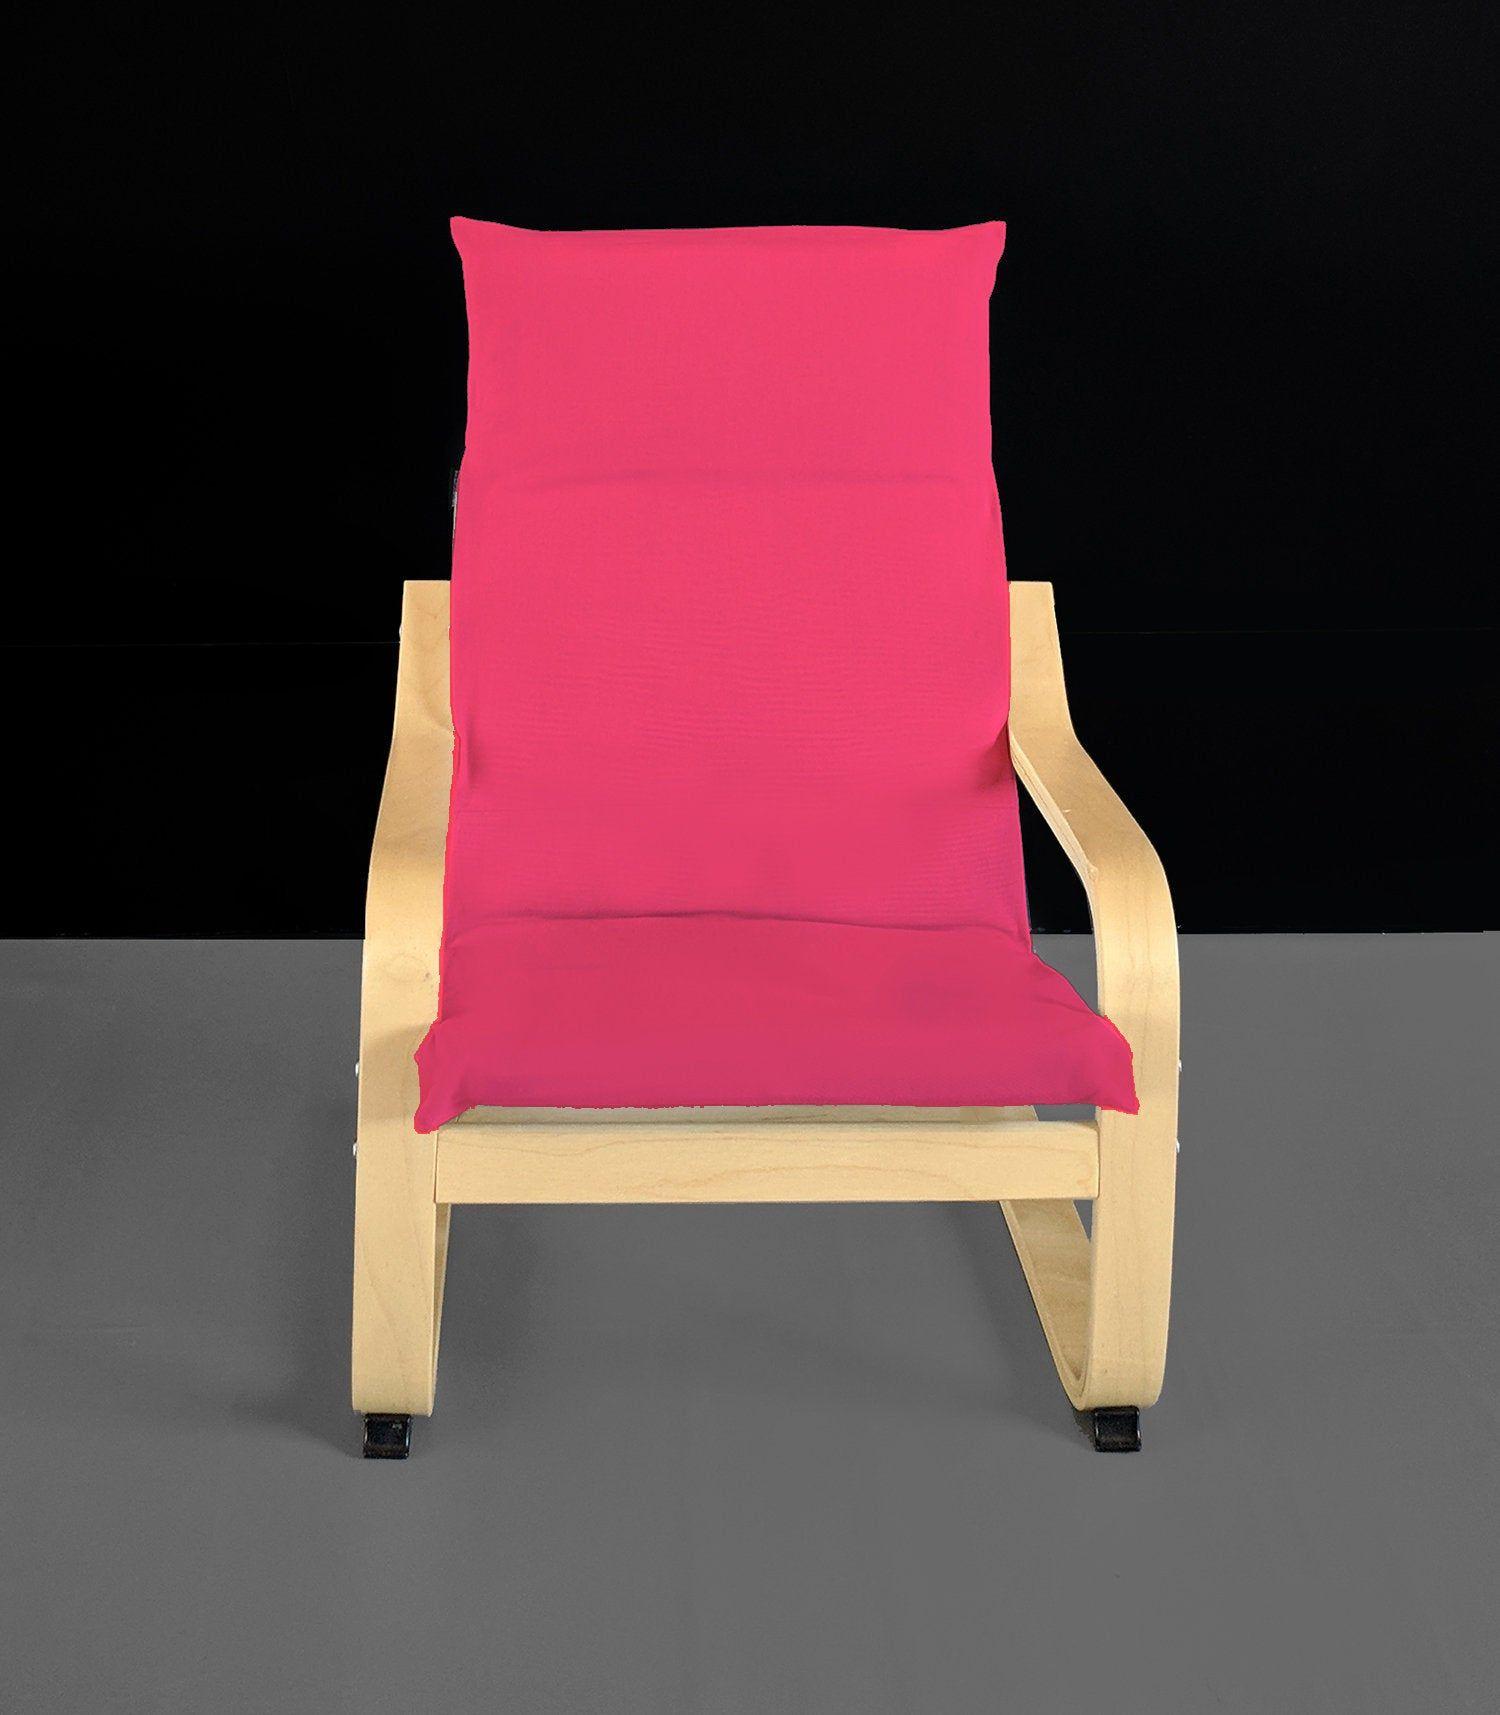 Solid Hot Pink IKEA KIDS POÄNG Cushion Slipcover Ikea